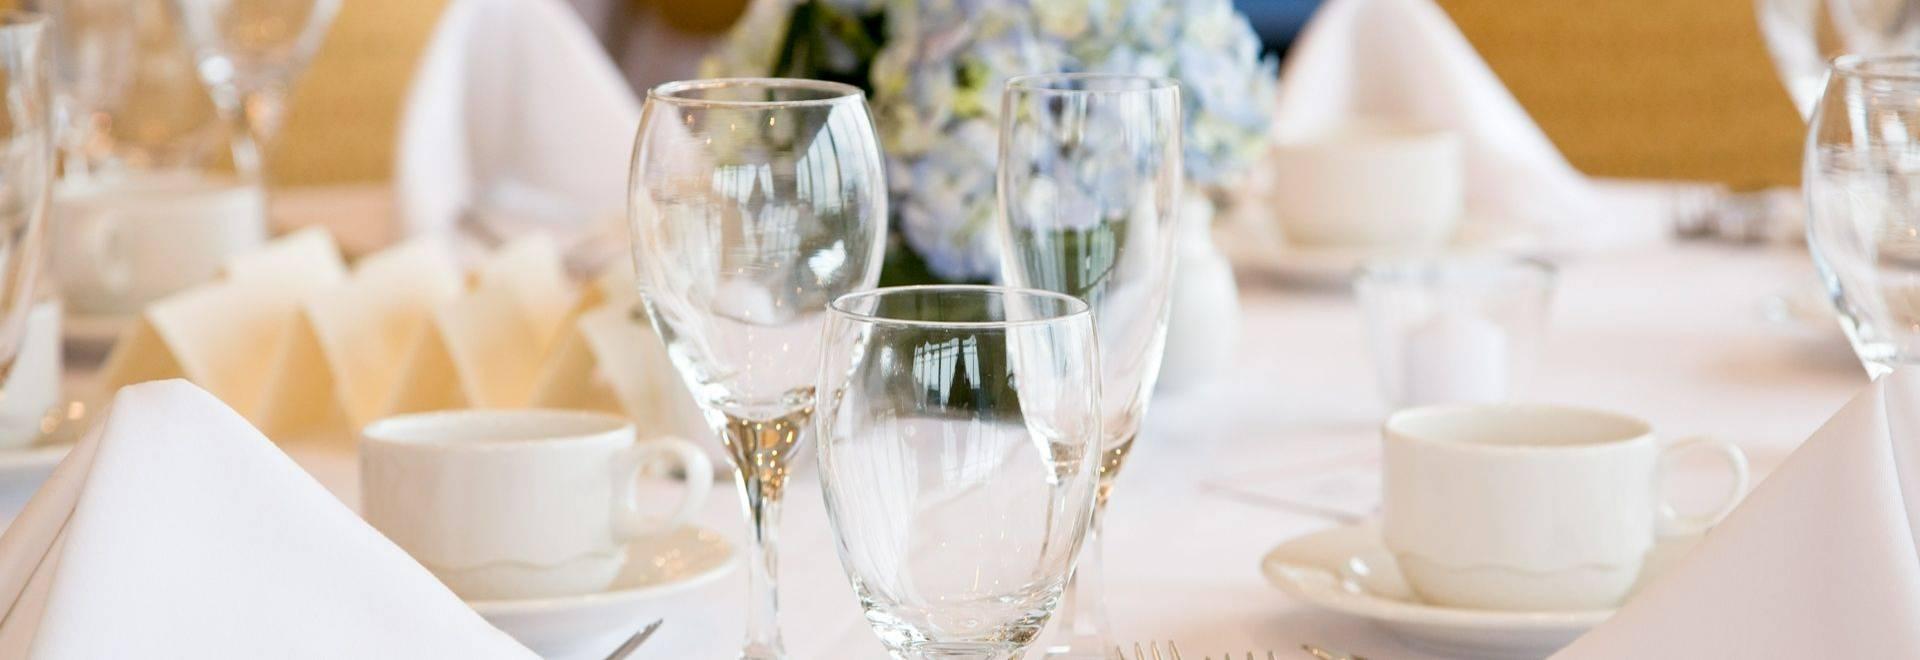 Wining & Dining Shutterstock 124796677   Long